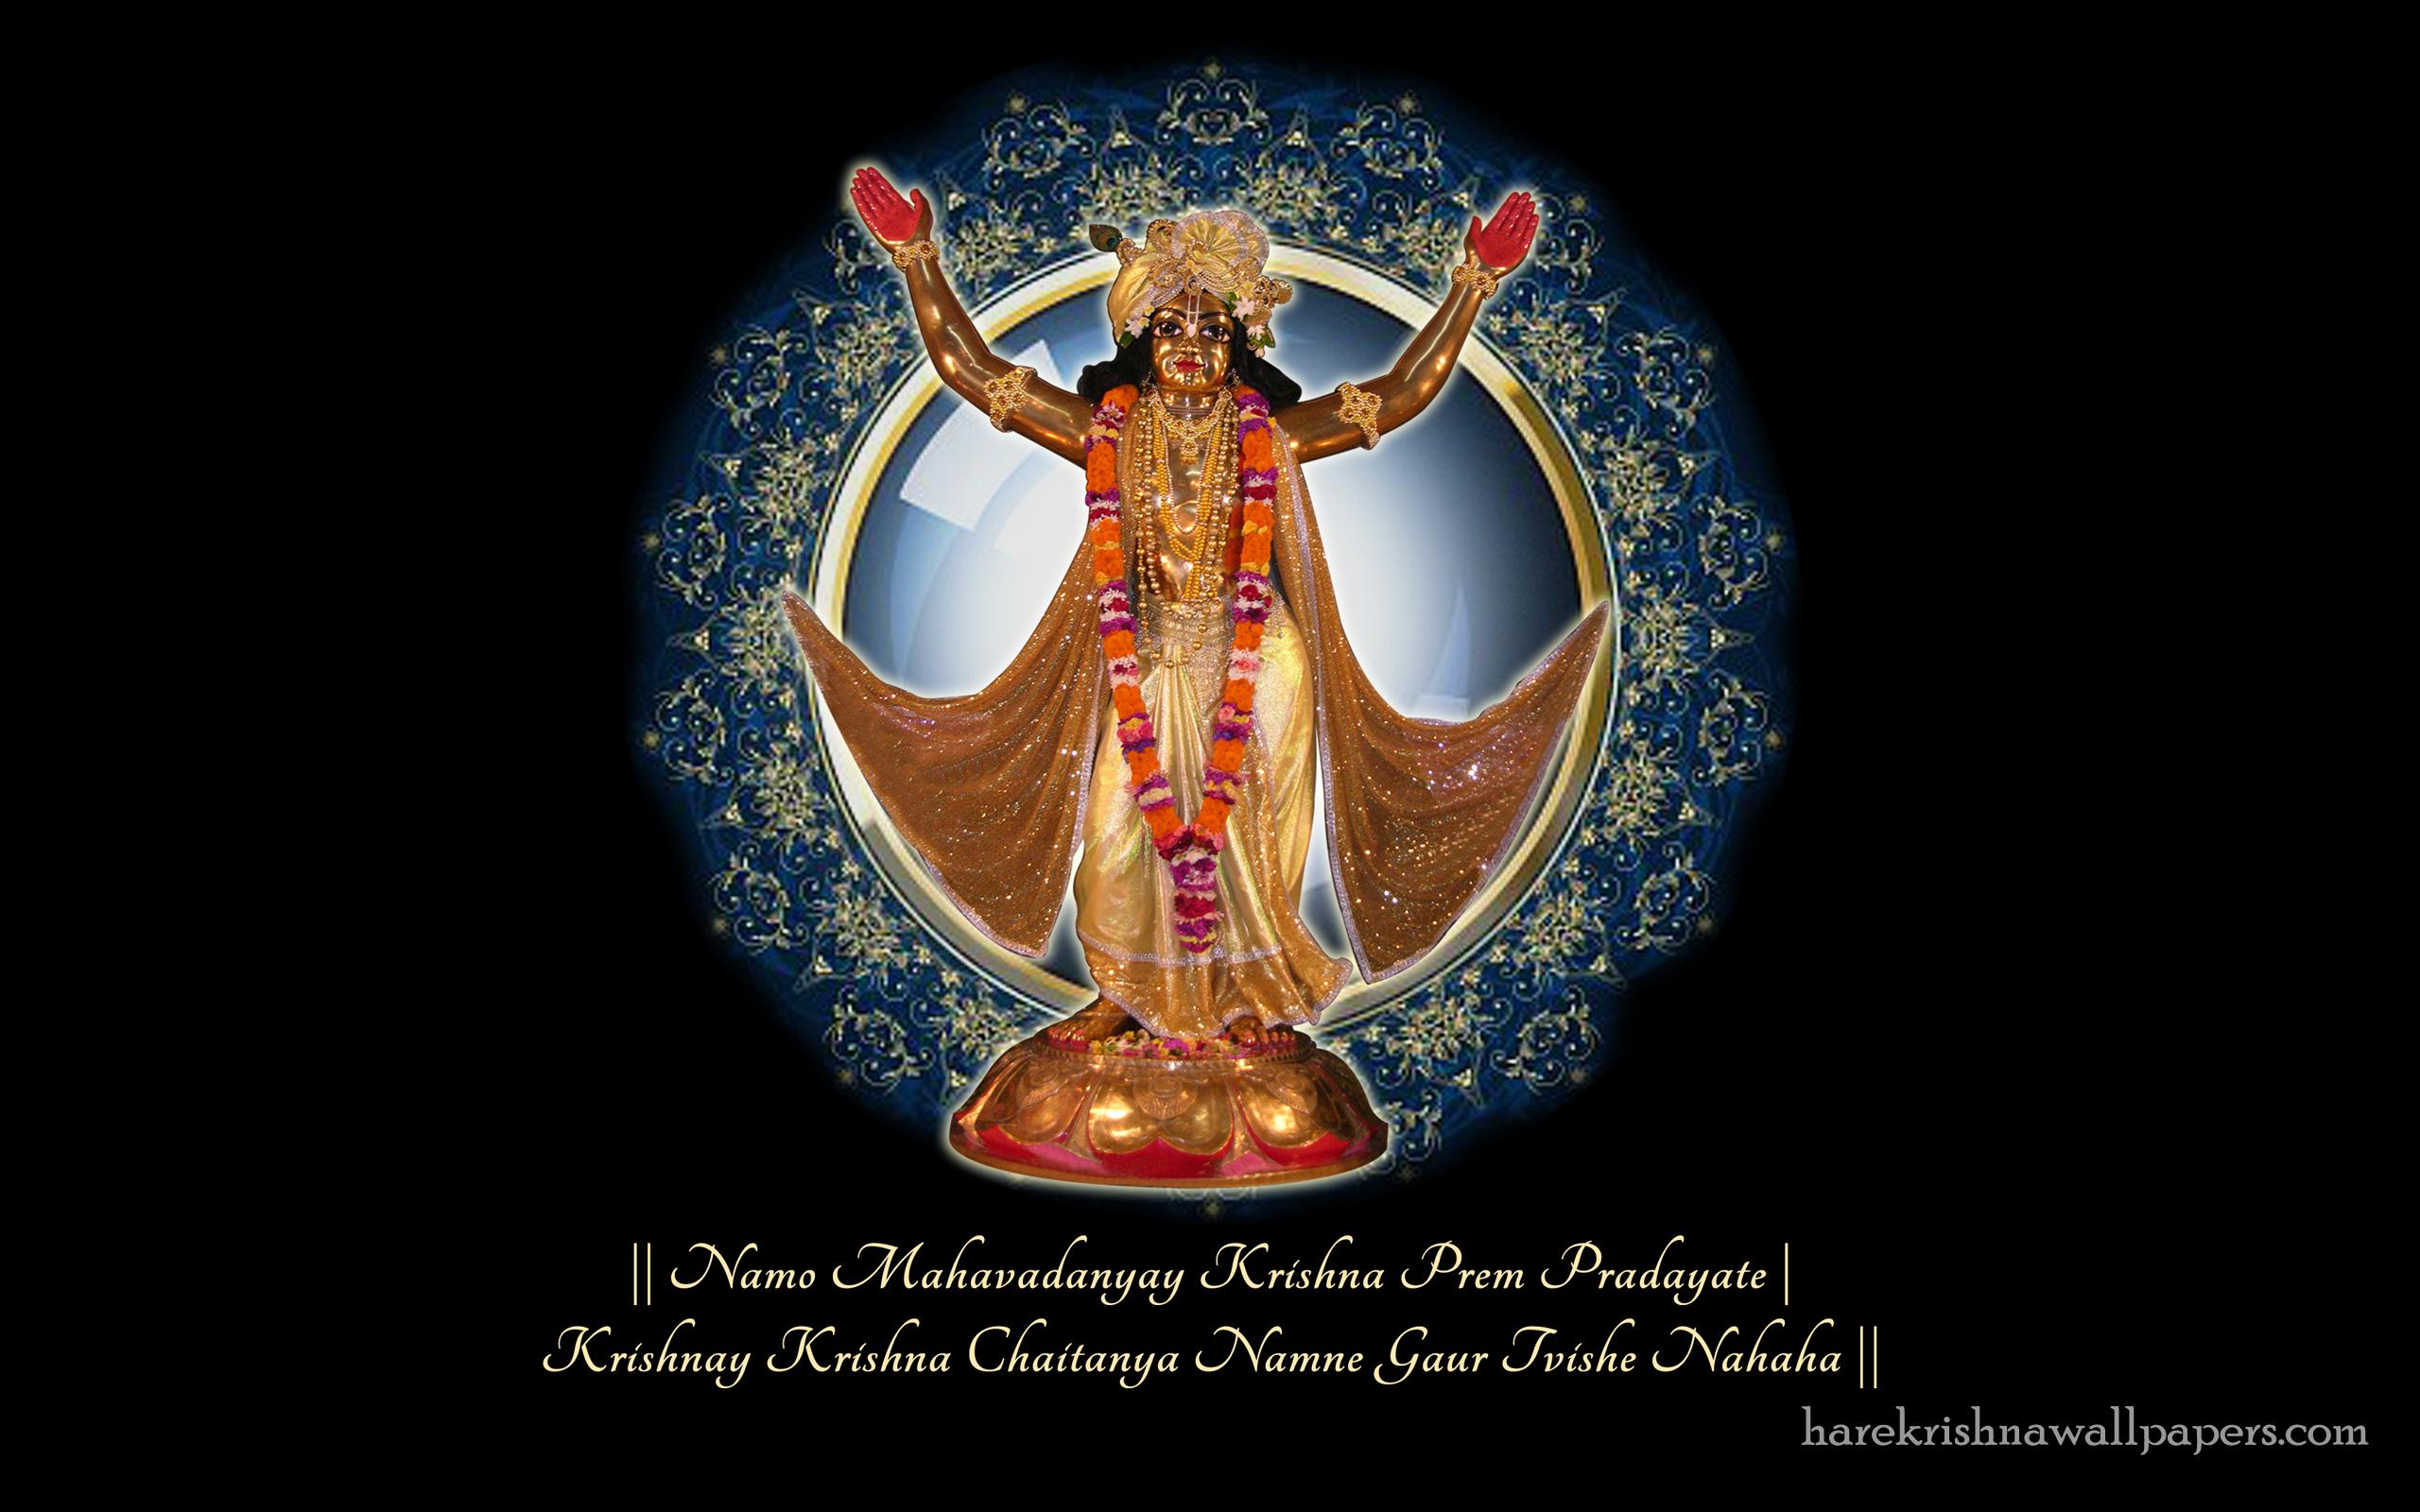 Chaitanya Mahaprabhu Wallpaper (001) Size 2560x1600 Download